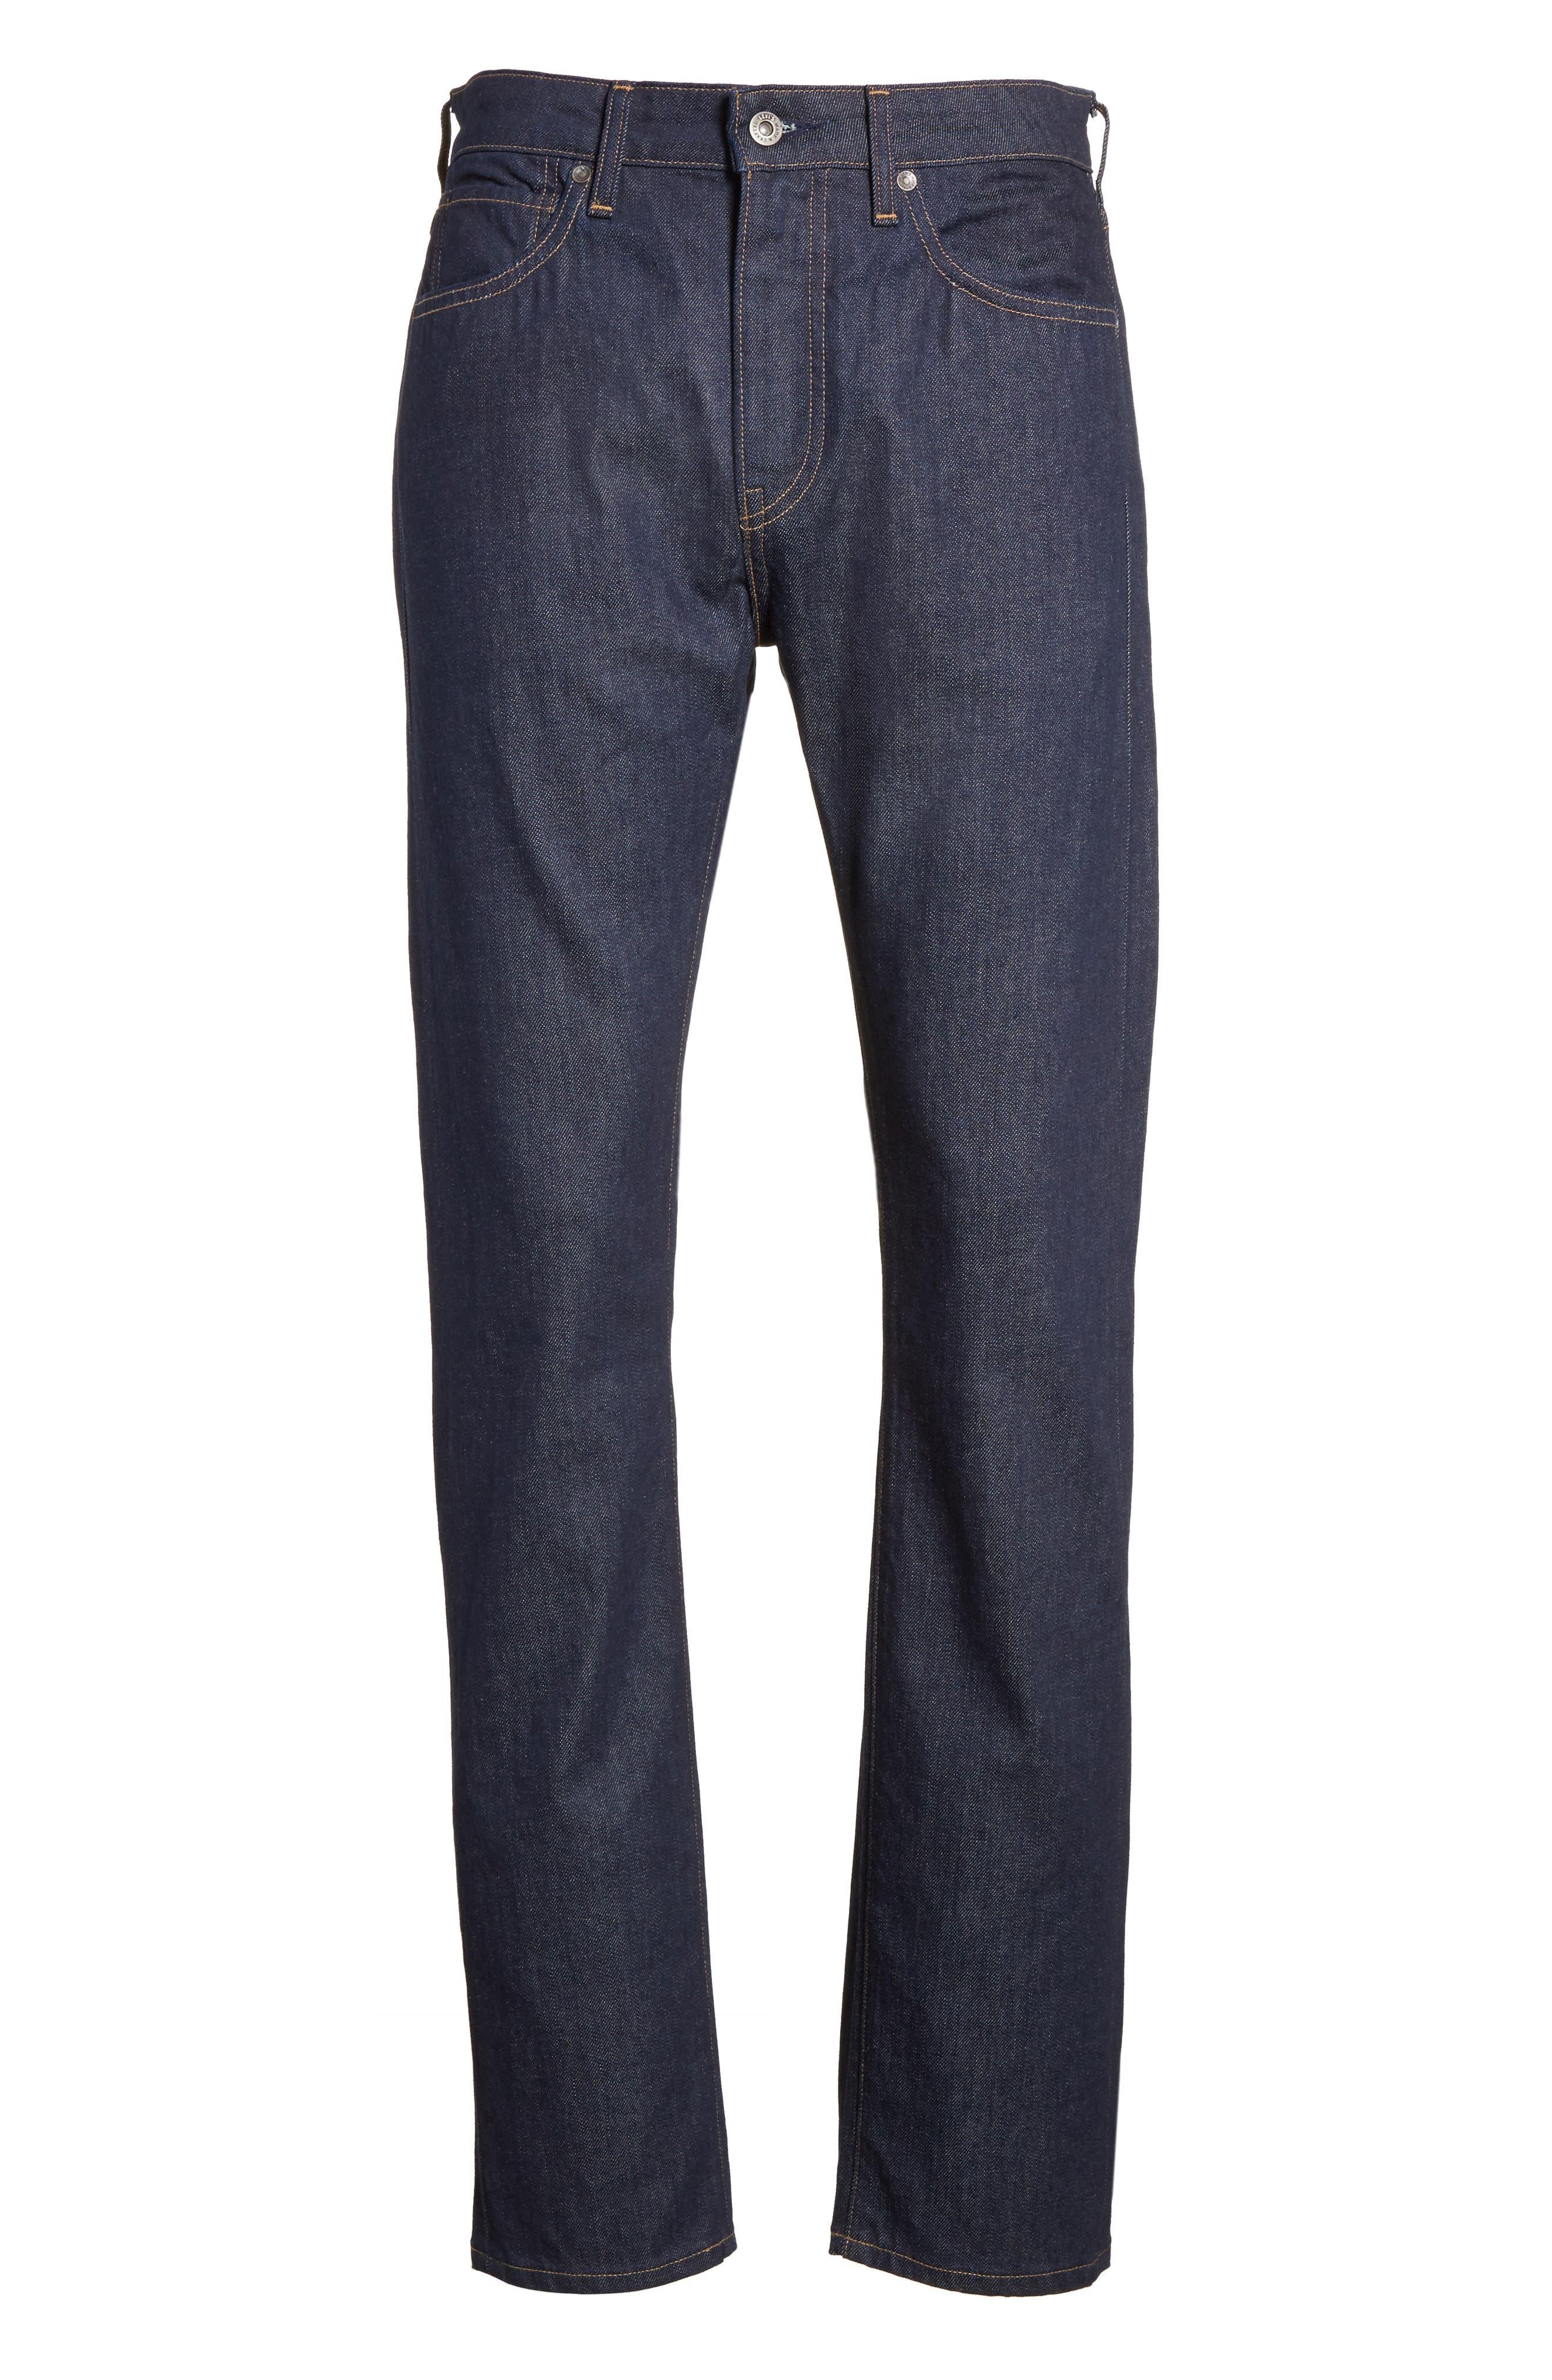 Tack Slim Fit Jeans,                             Alternate thumbnail 6, color,                             Dark Blue